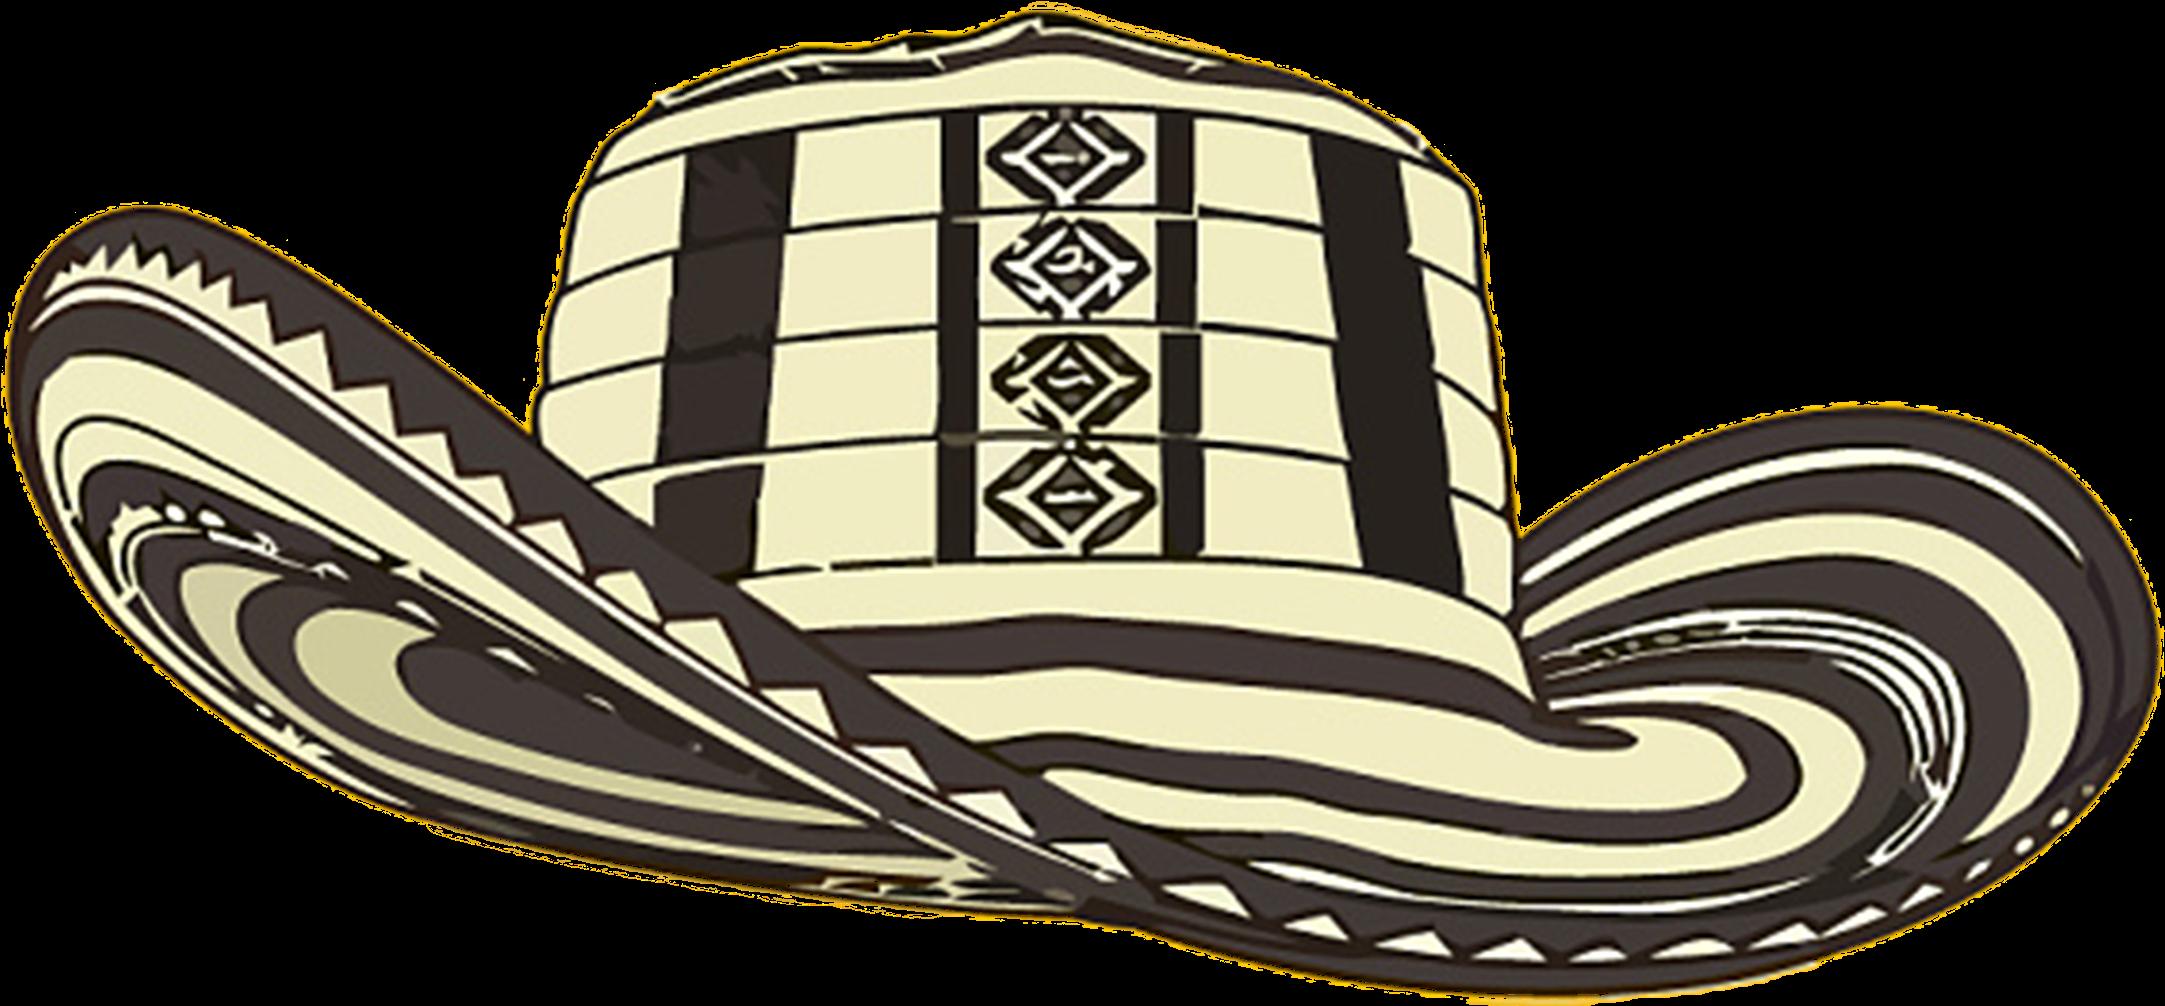 For Free Download On Mbtskoudsalg Hat Sombrero Vueltiao.